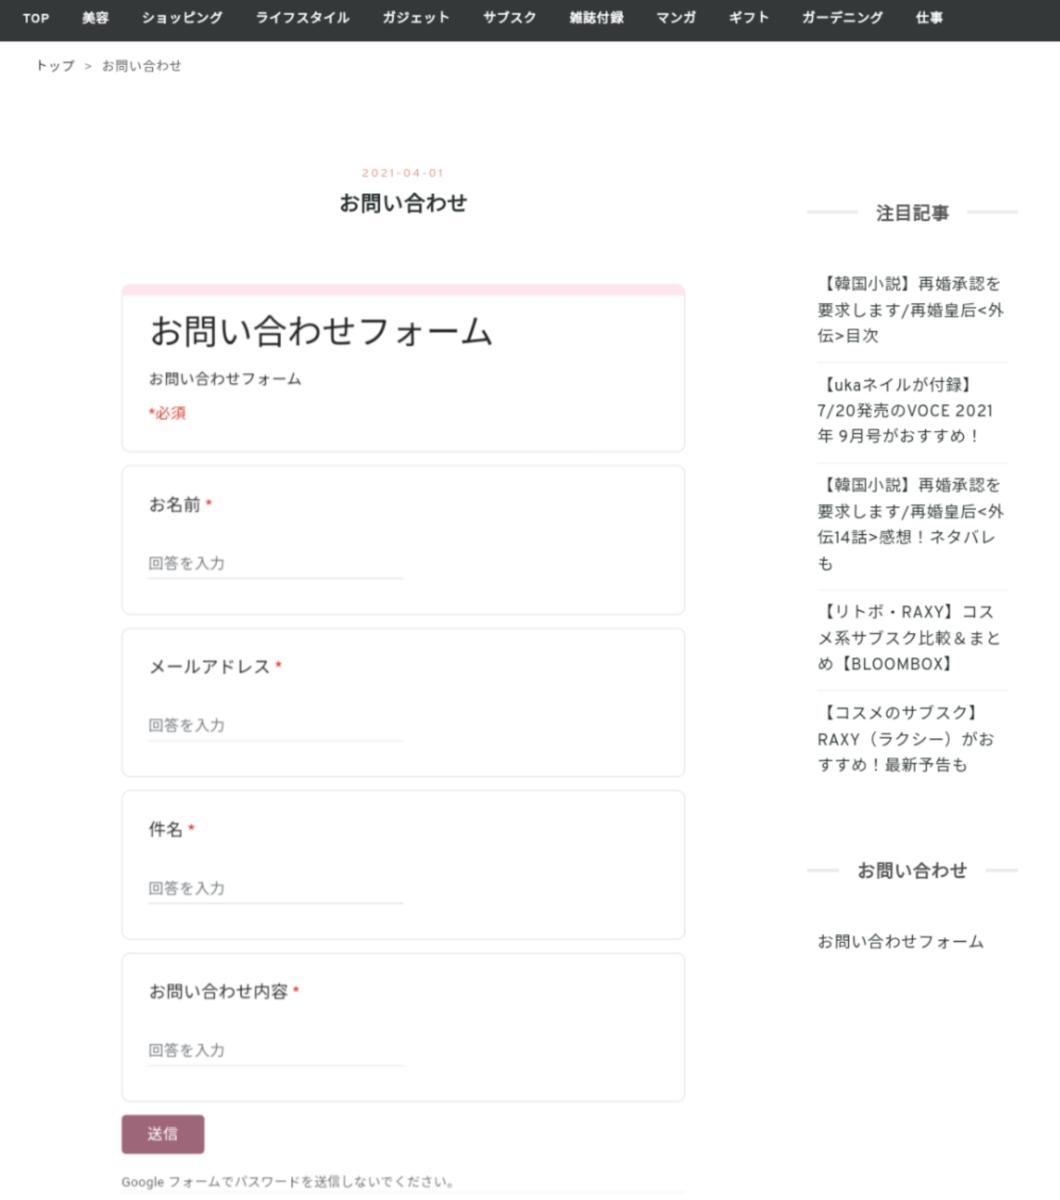 f:id:otoku-otaku:20210623190910p:plain